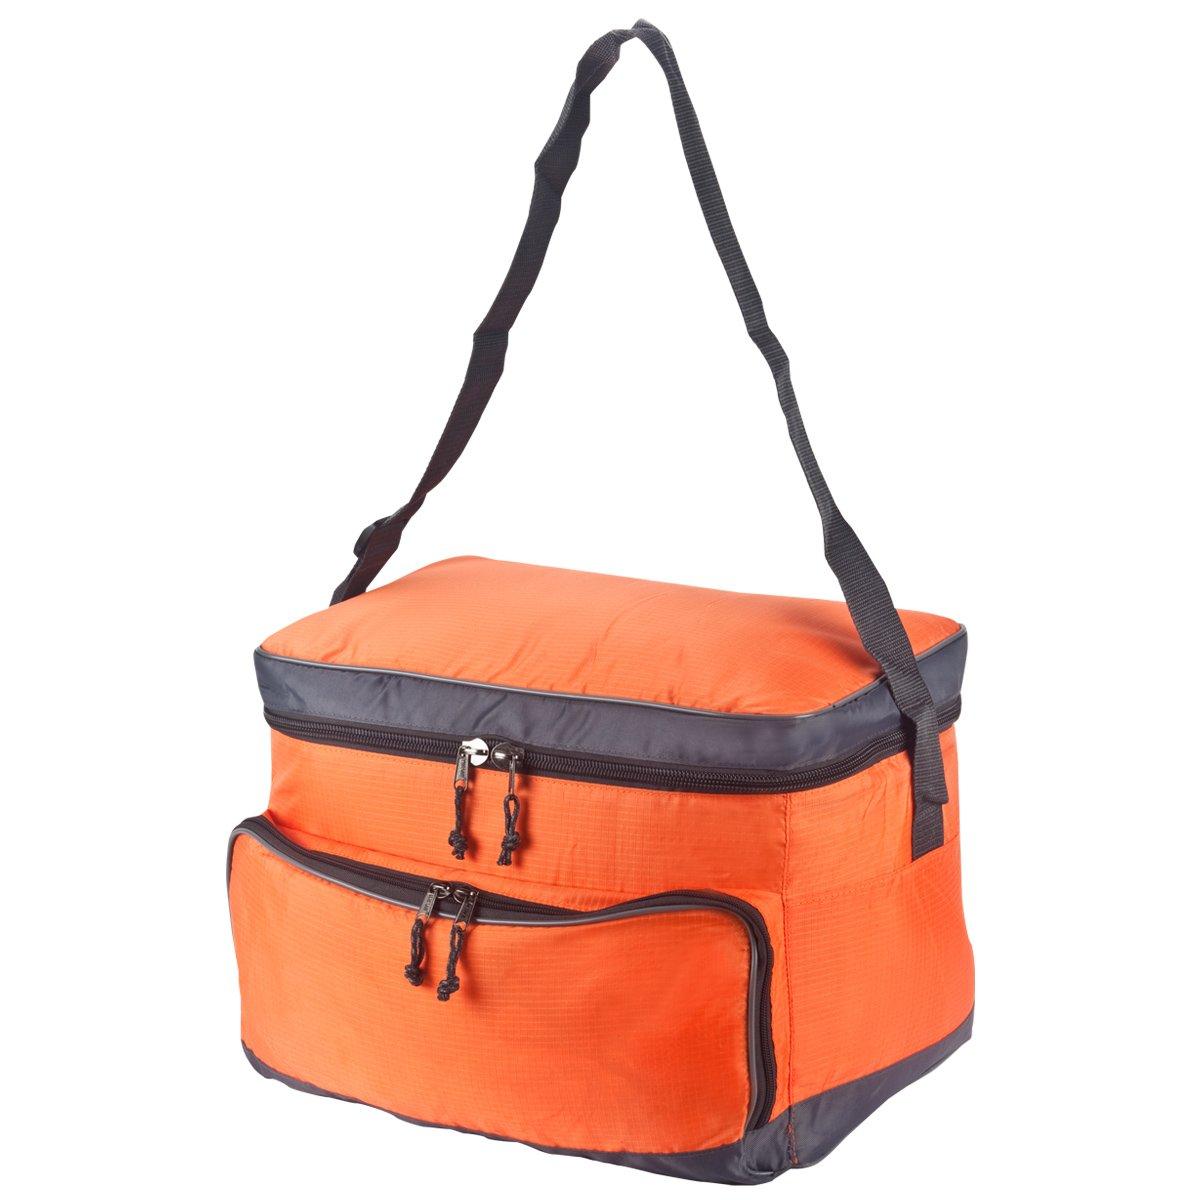 Amazon.com: Wave Premium cara suave bolsa de Cooler – 50 ...